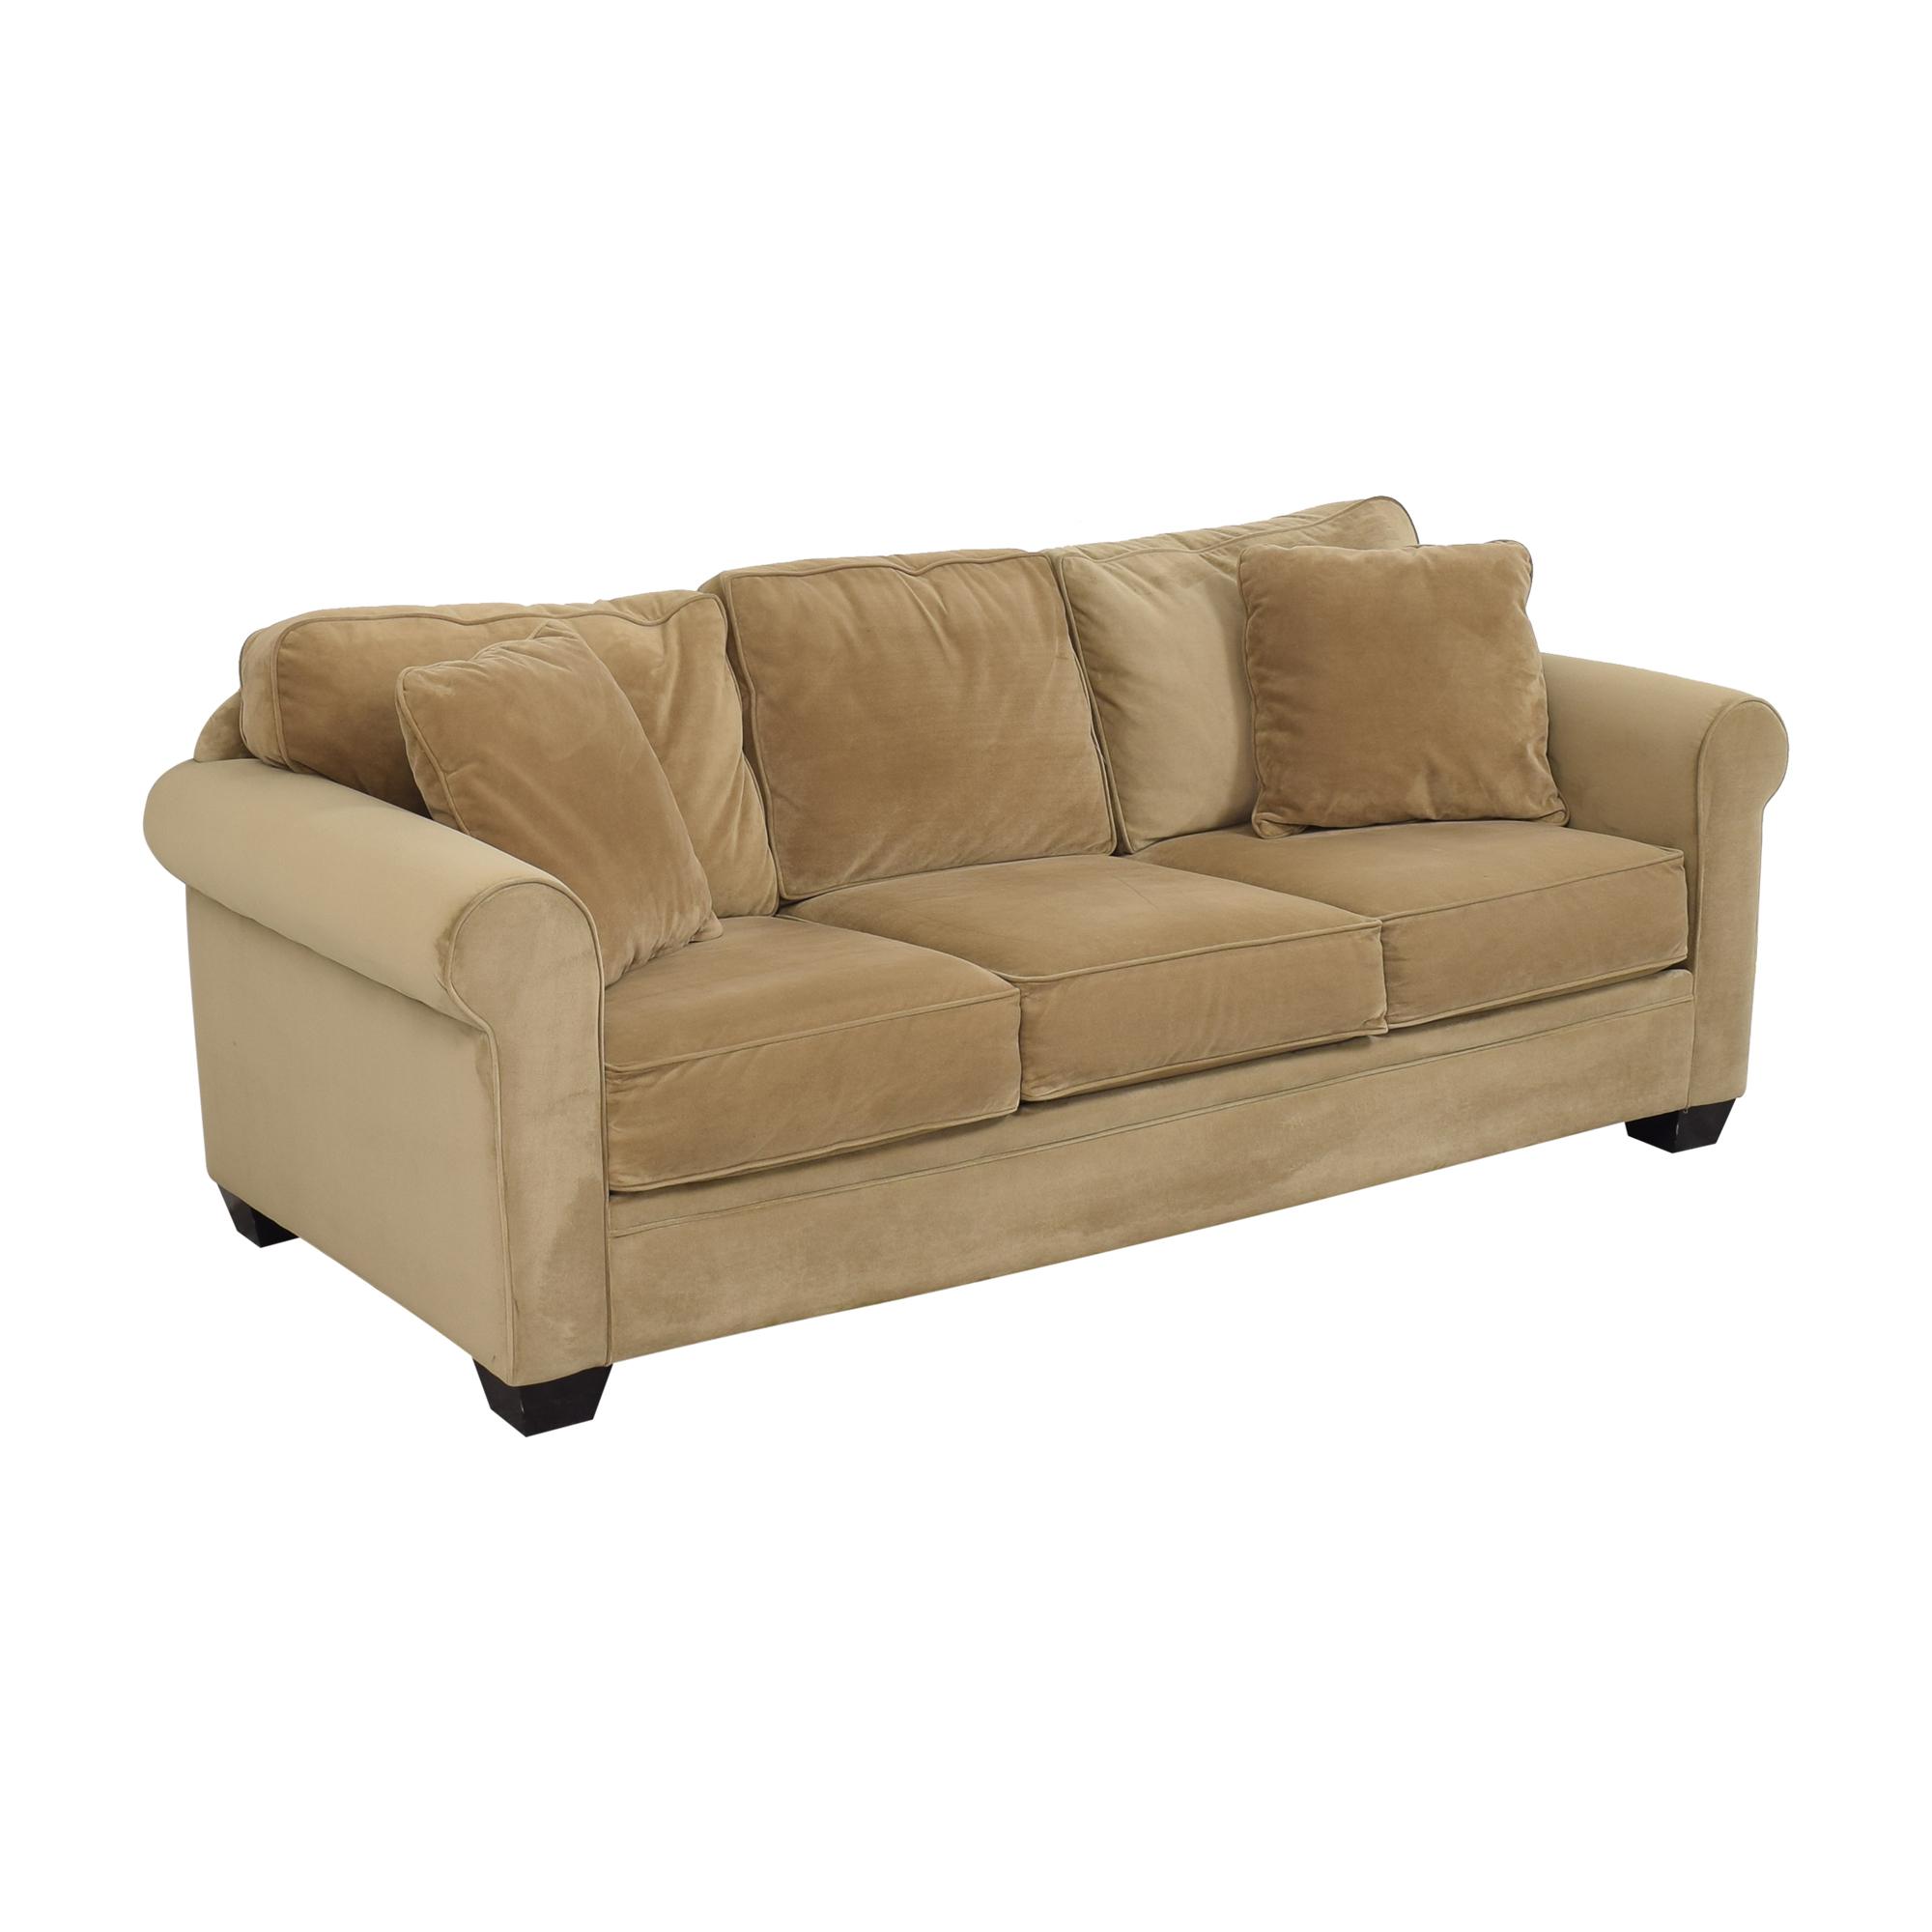 Macy's Macy's Roll Arm Sofa price